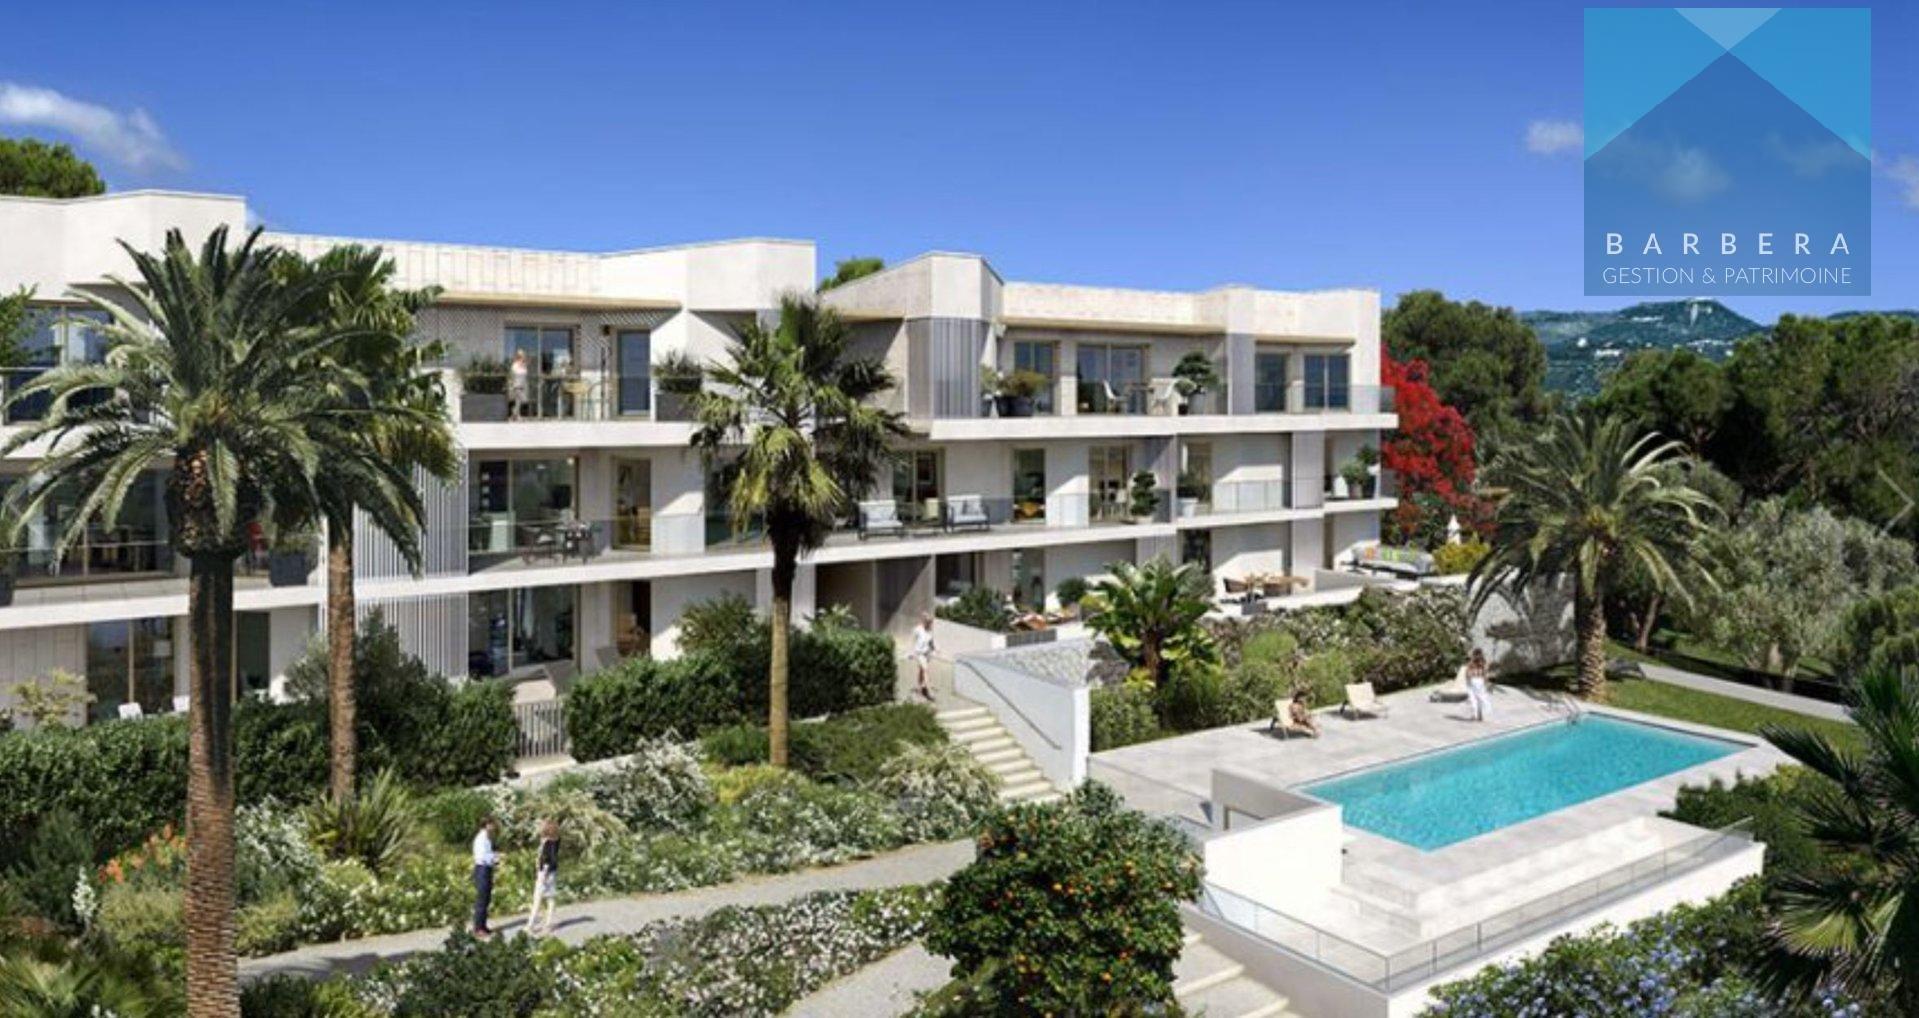 Programme appartement 92 m²